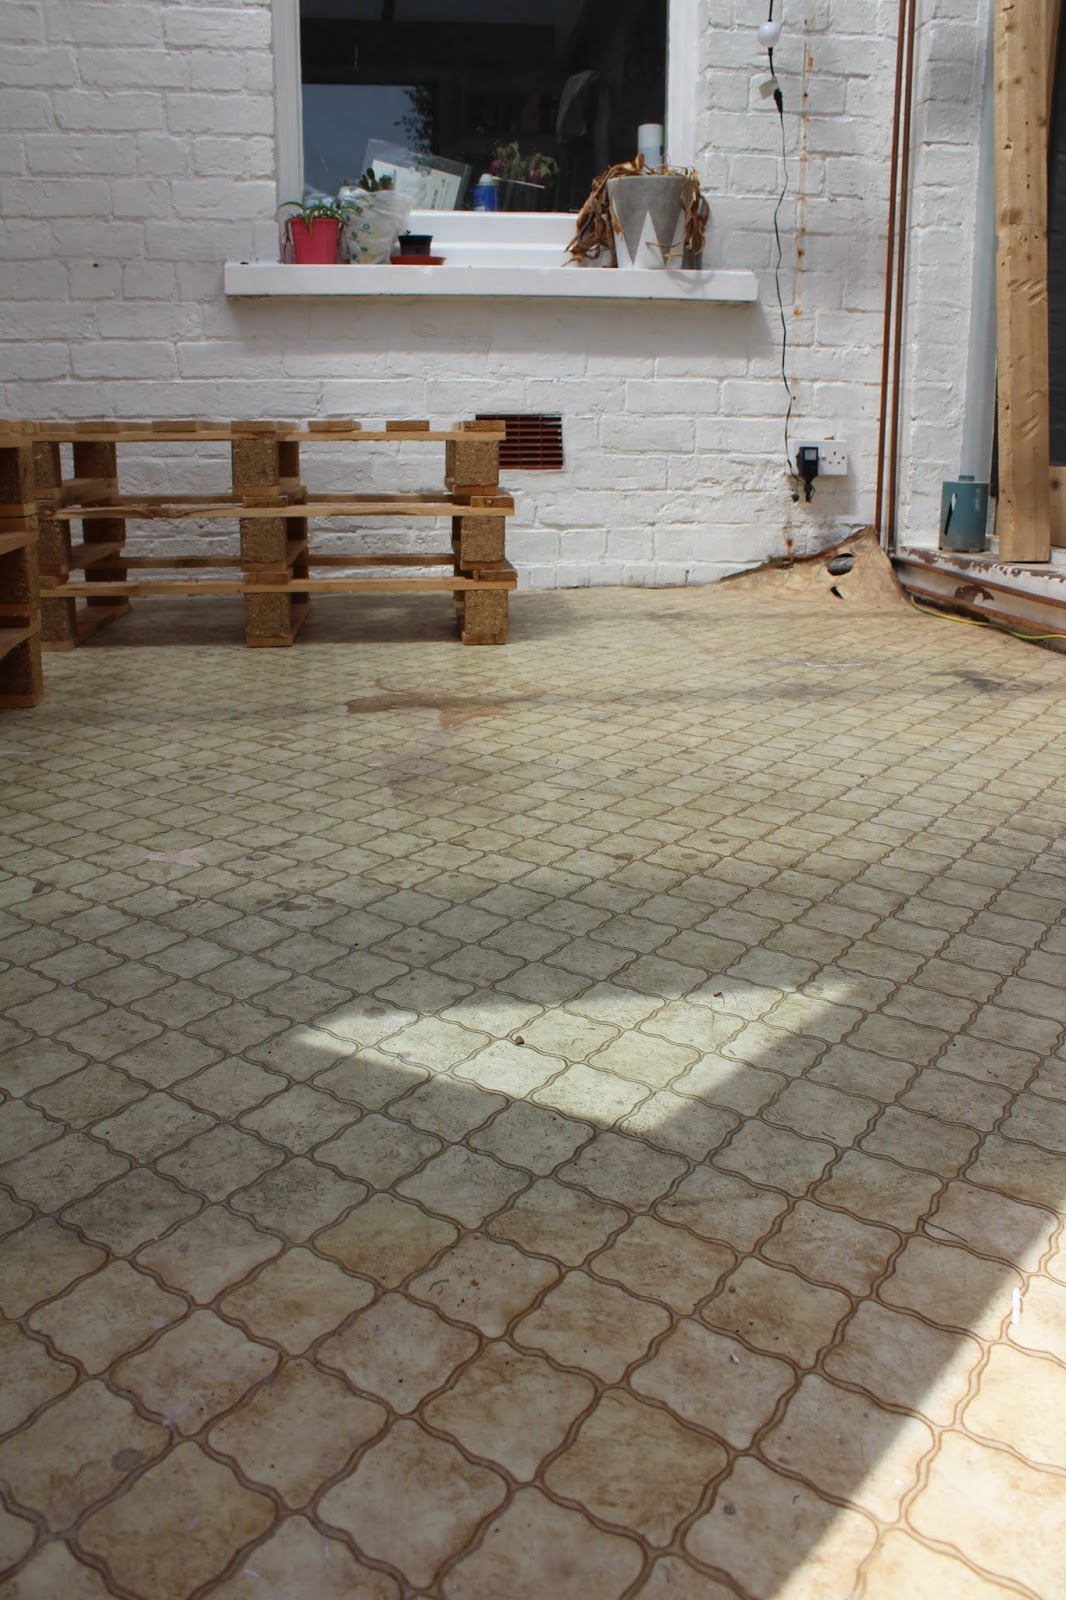 Replacing an Old Lino Floor